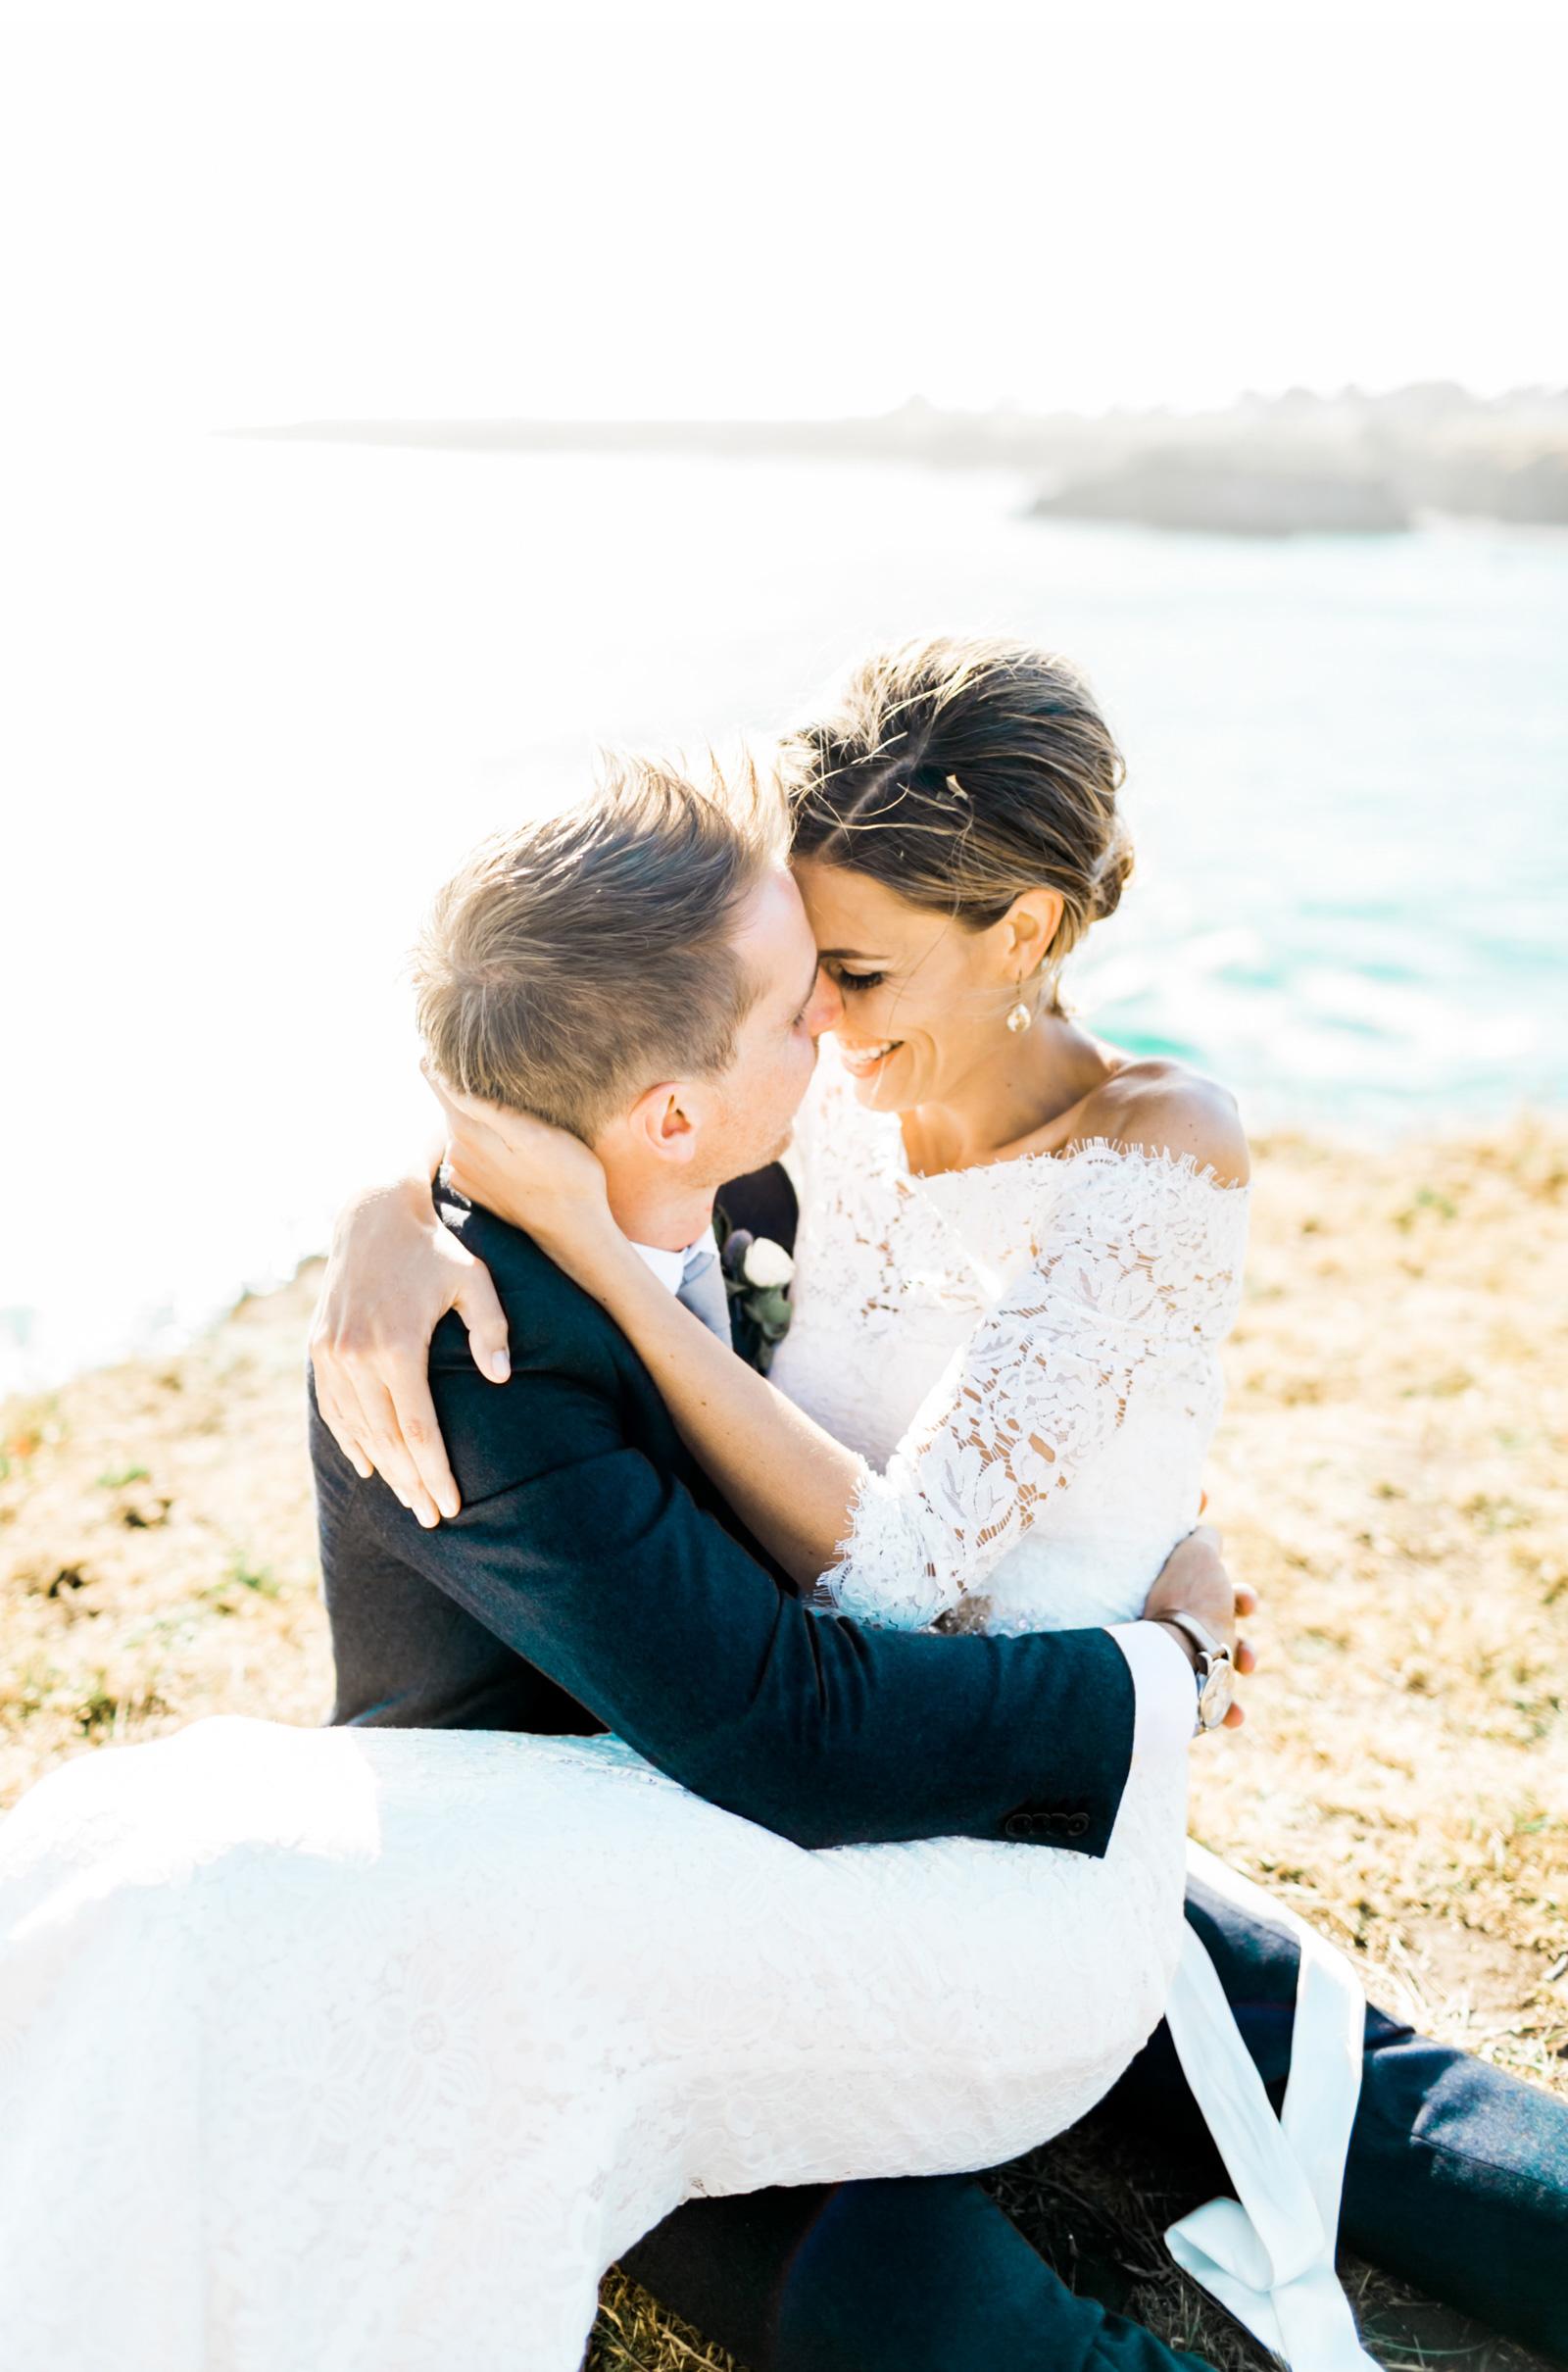 Style-Me-Pretty-Mendocino-Wedding-Natalie-Schutt-Photography_16.jpg